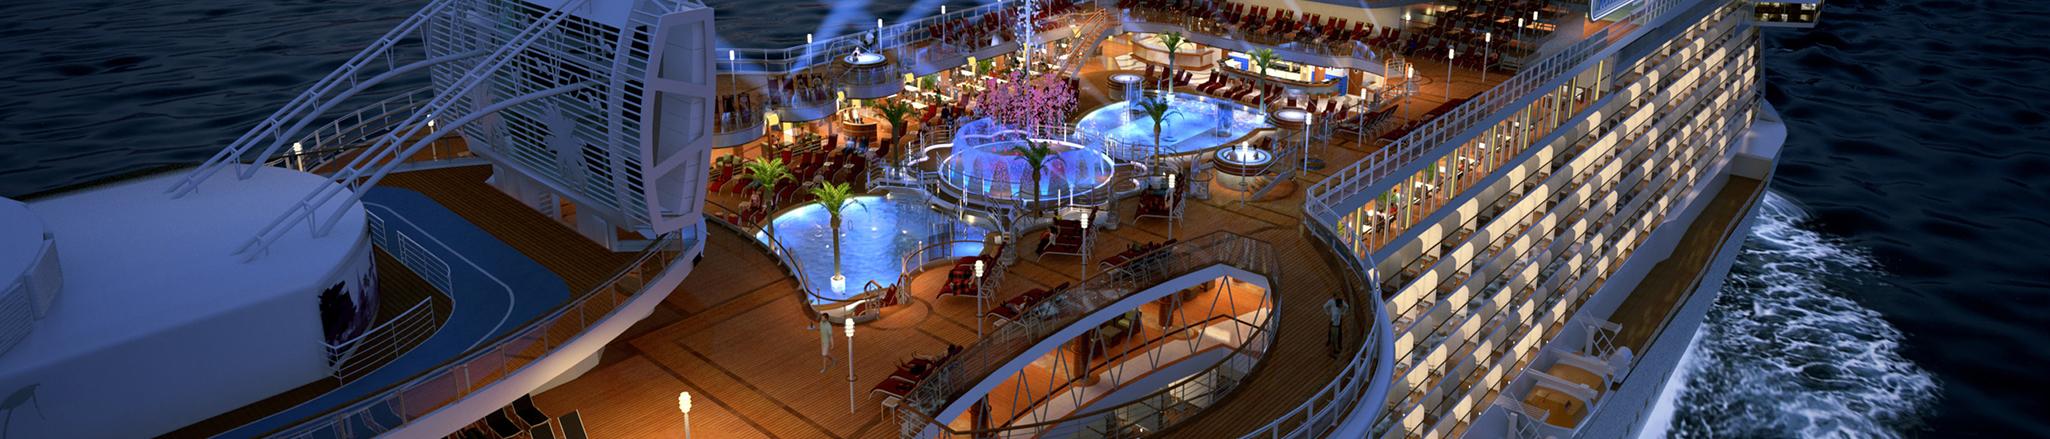 Best Cruise Ships